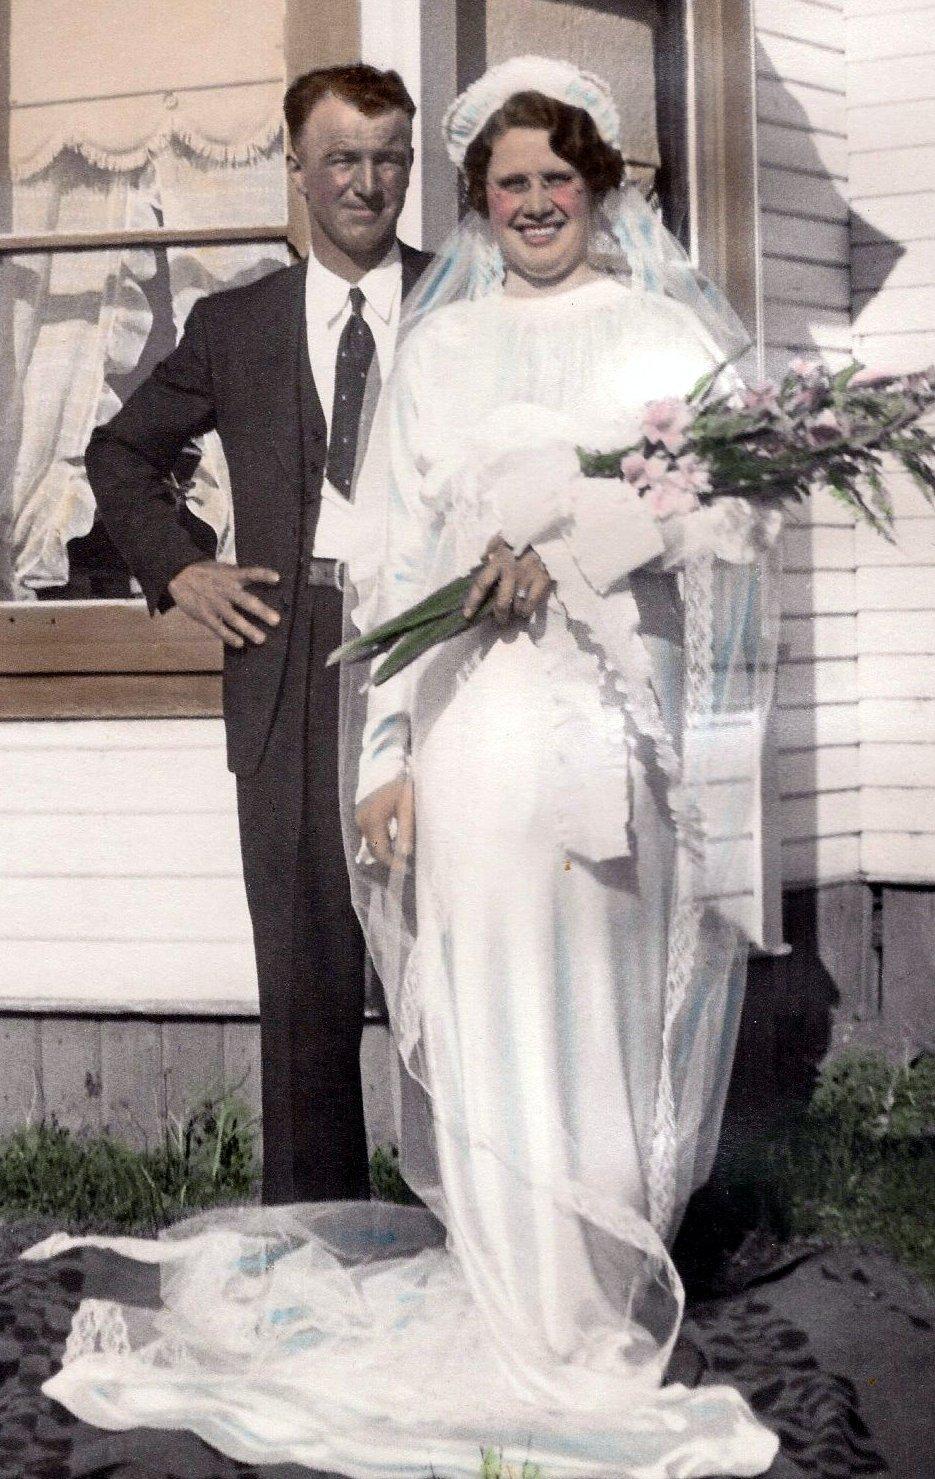 lewiston idaho marriages in 2006